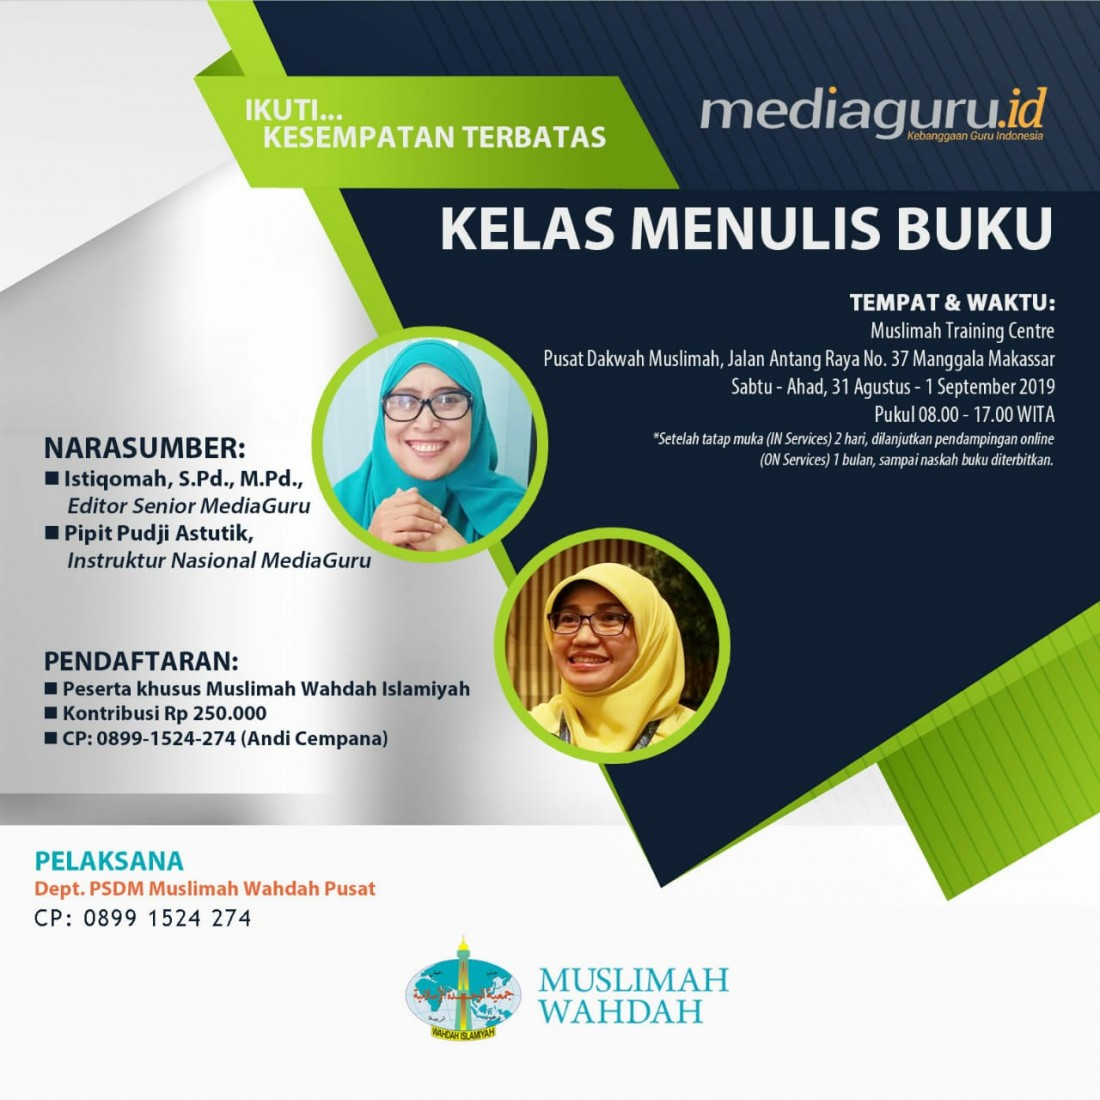 Kelas Menulis Buku Makassar (31 Agustus - 1 September 2019)